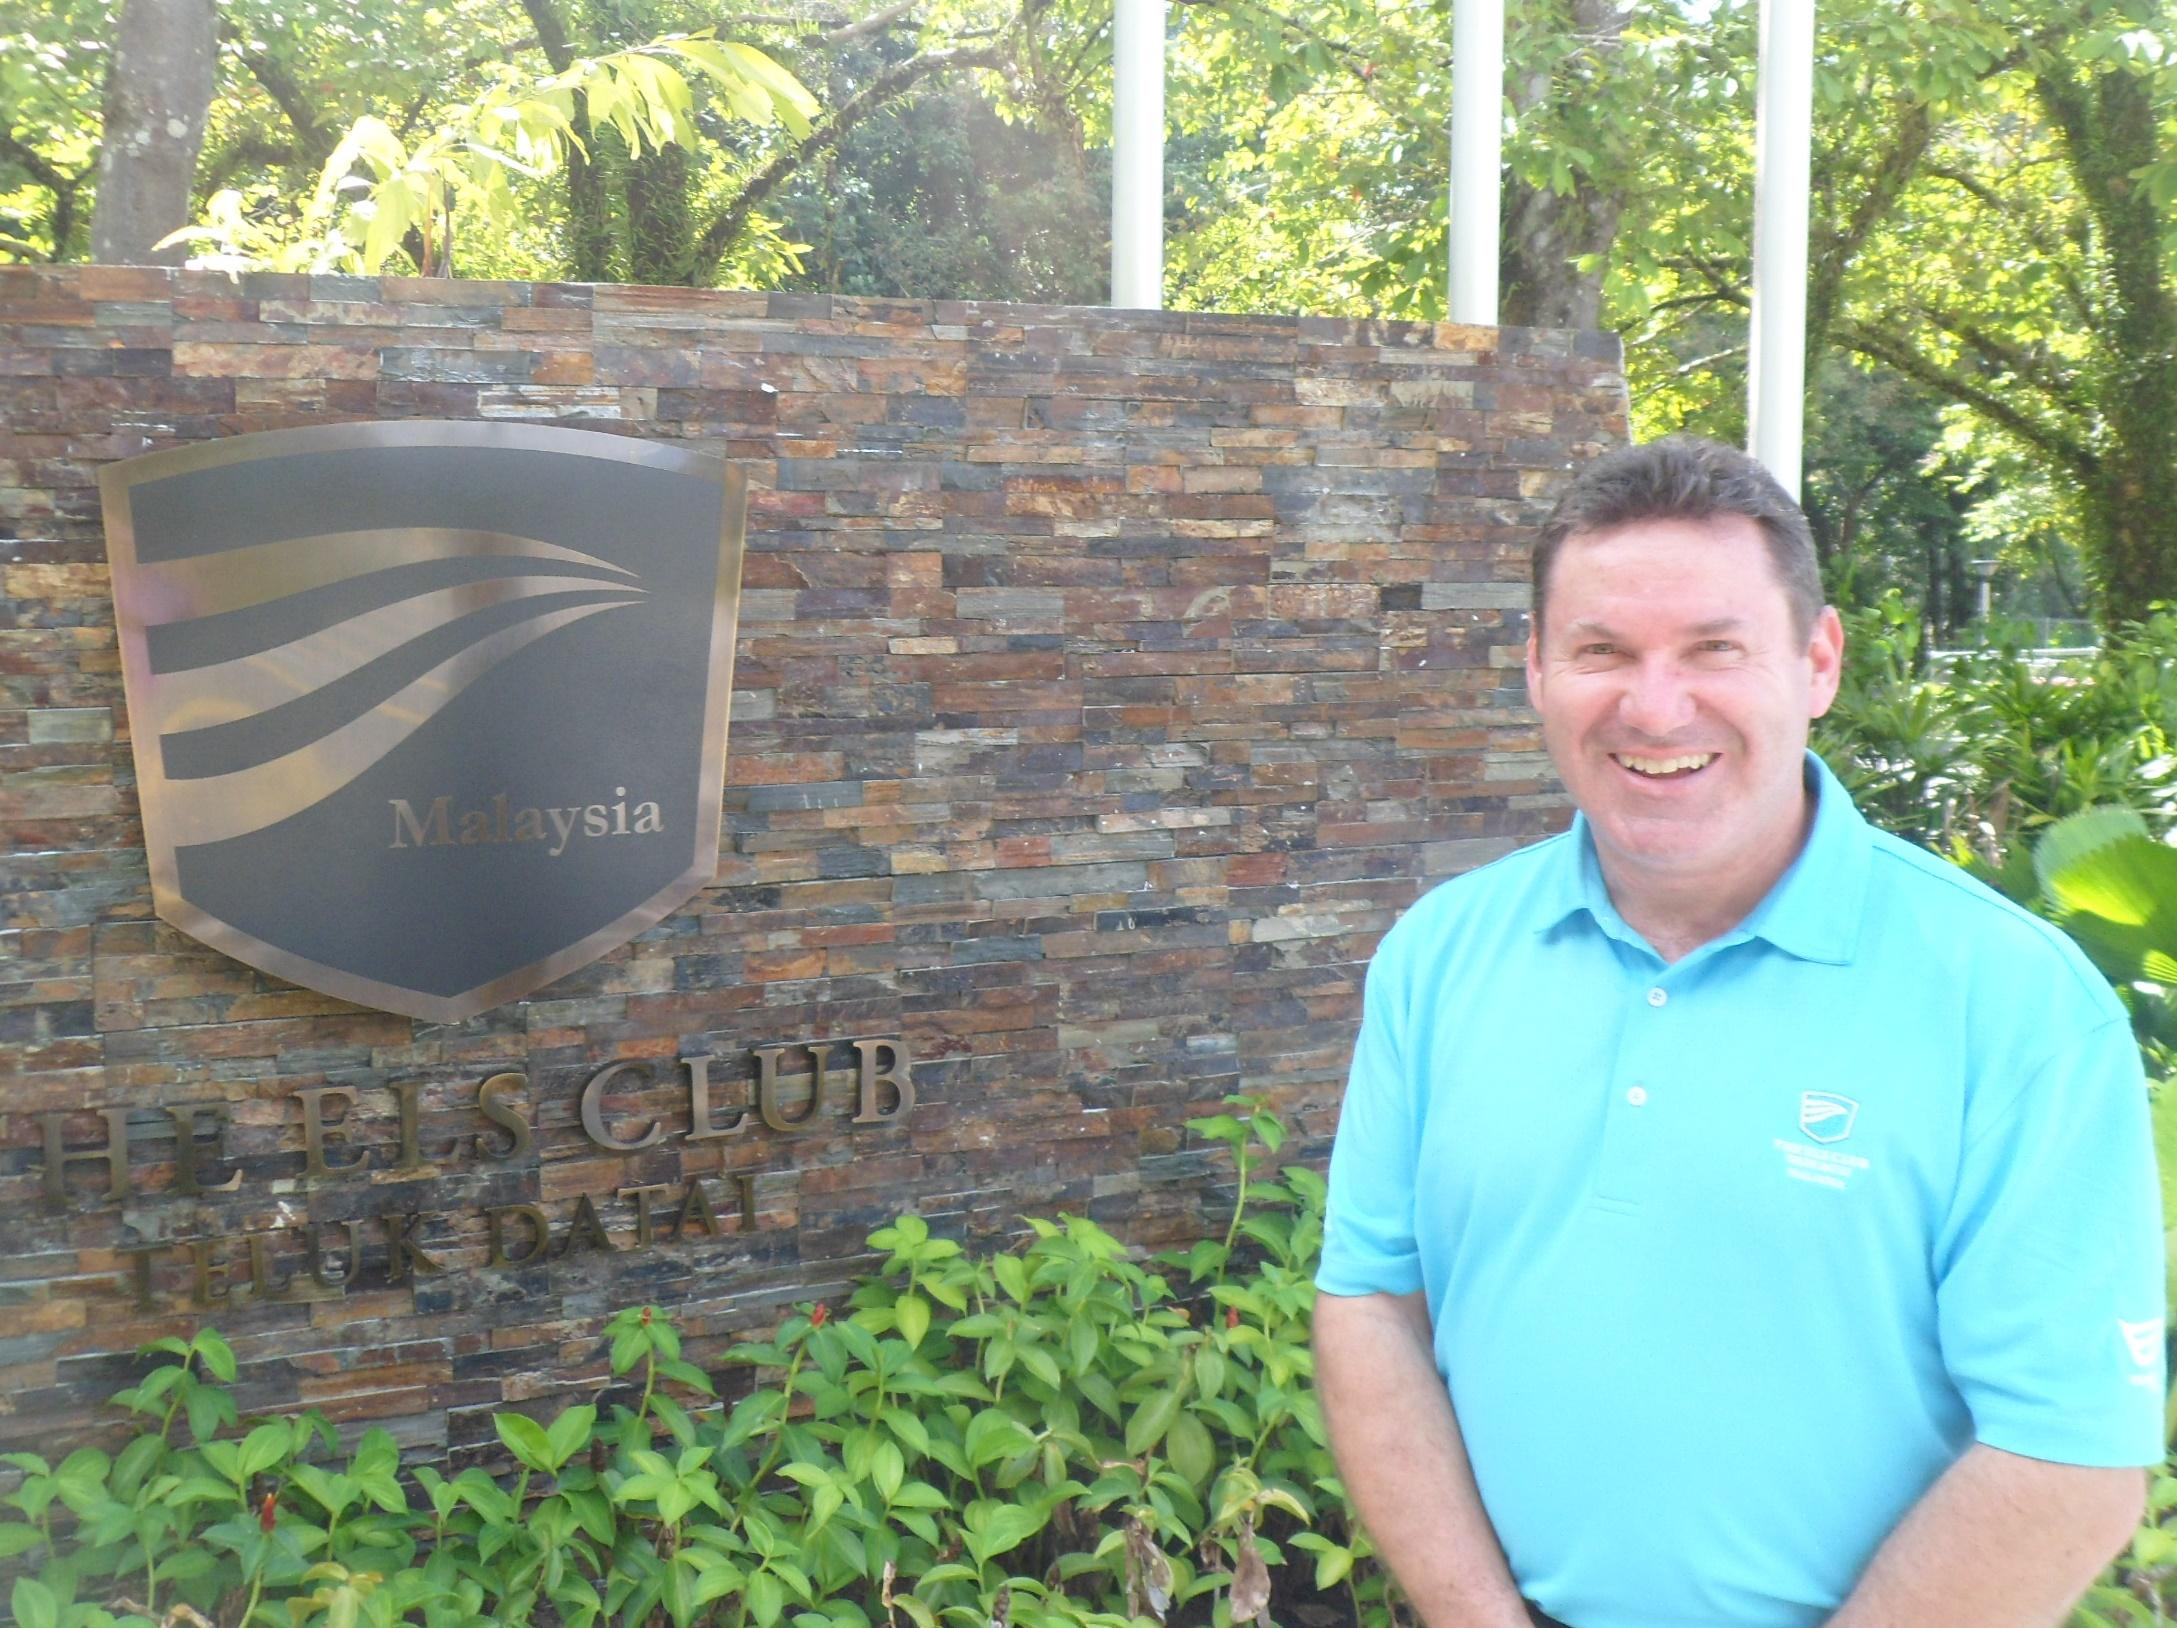 David Townend, Els Club Malaysia, Senior Vice President on-site at The Els Club Teluk Datai